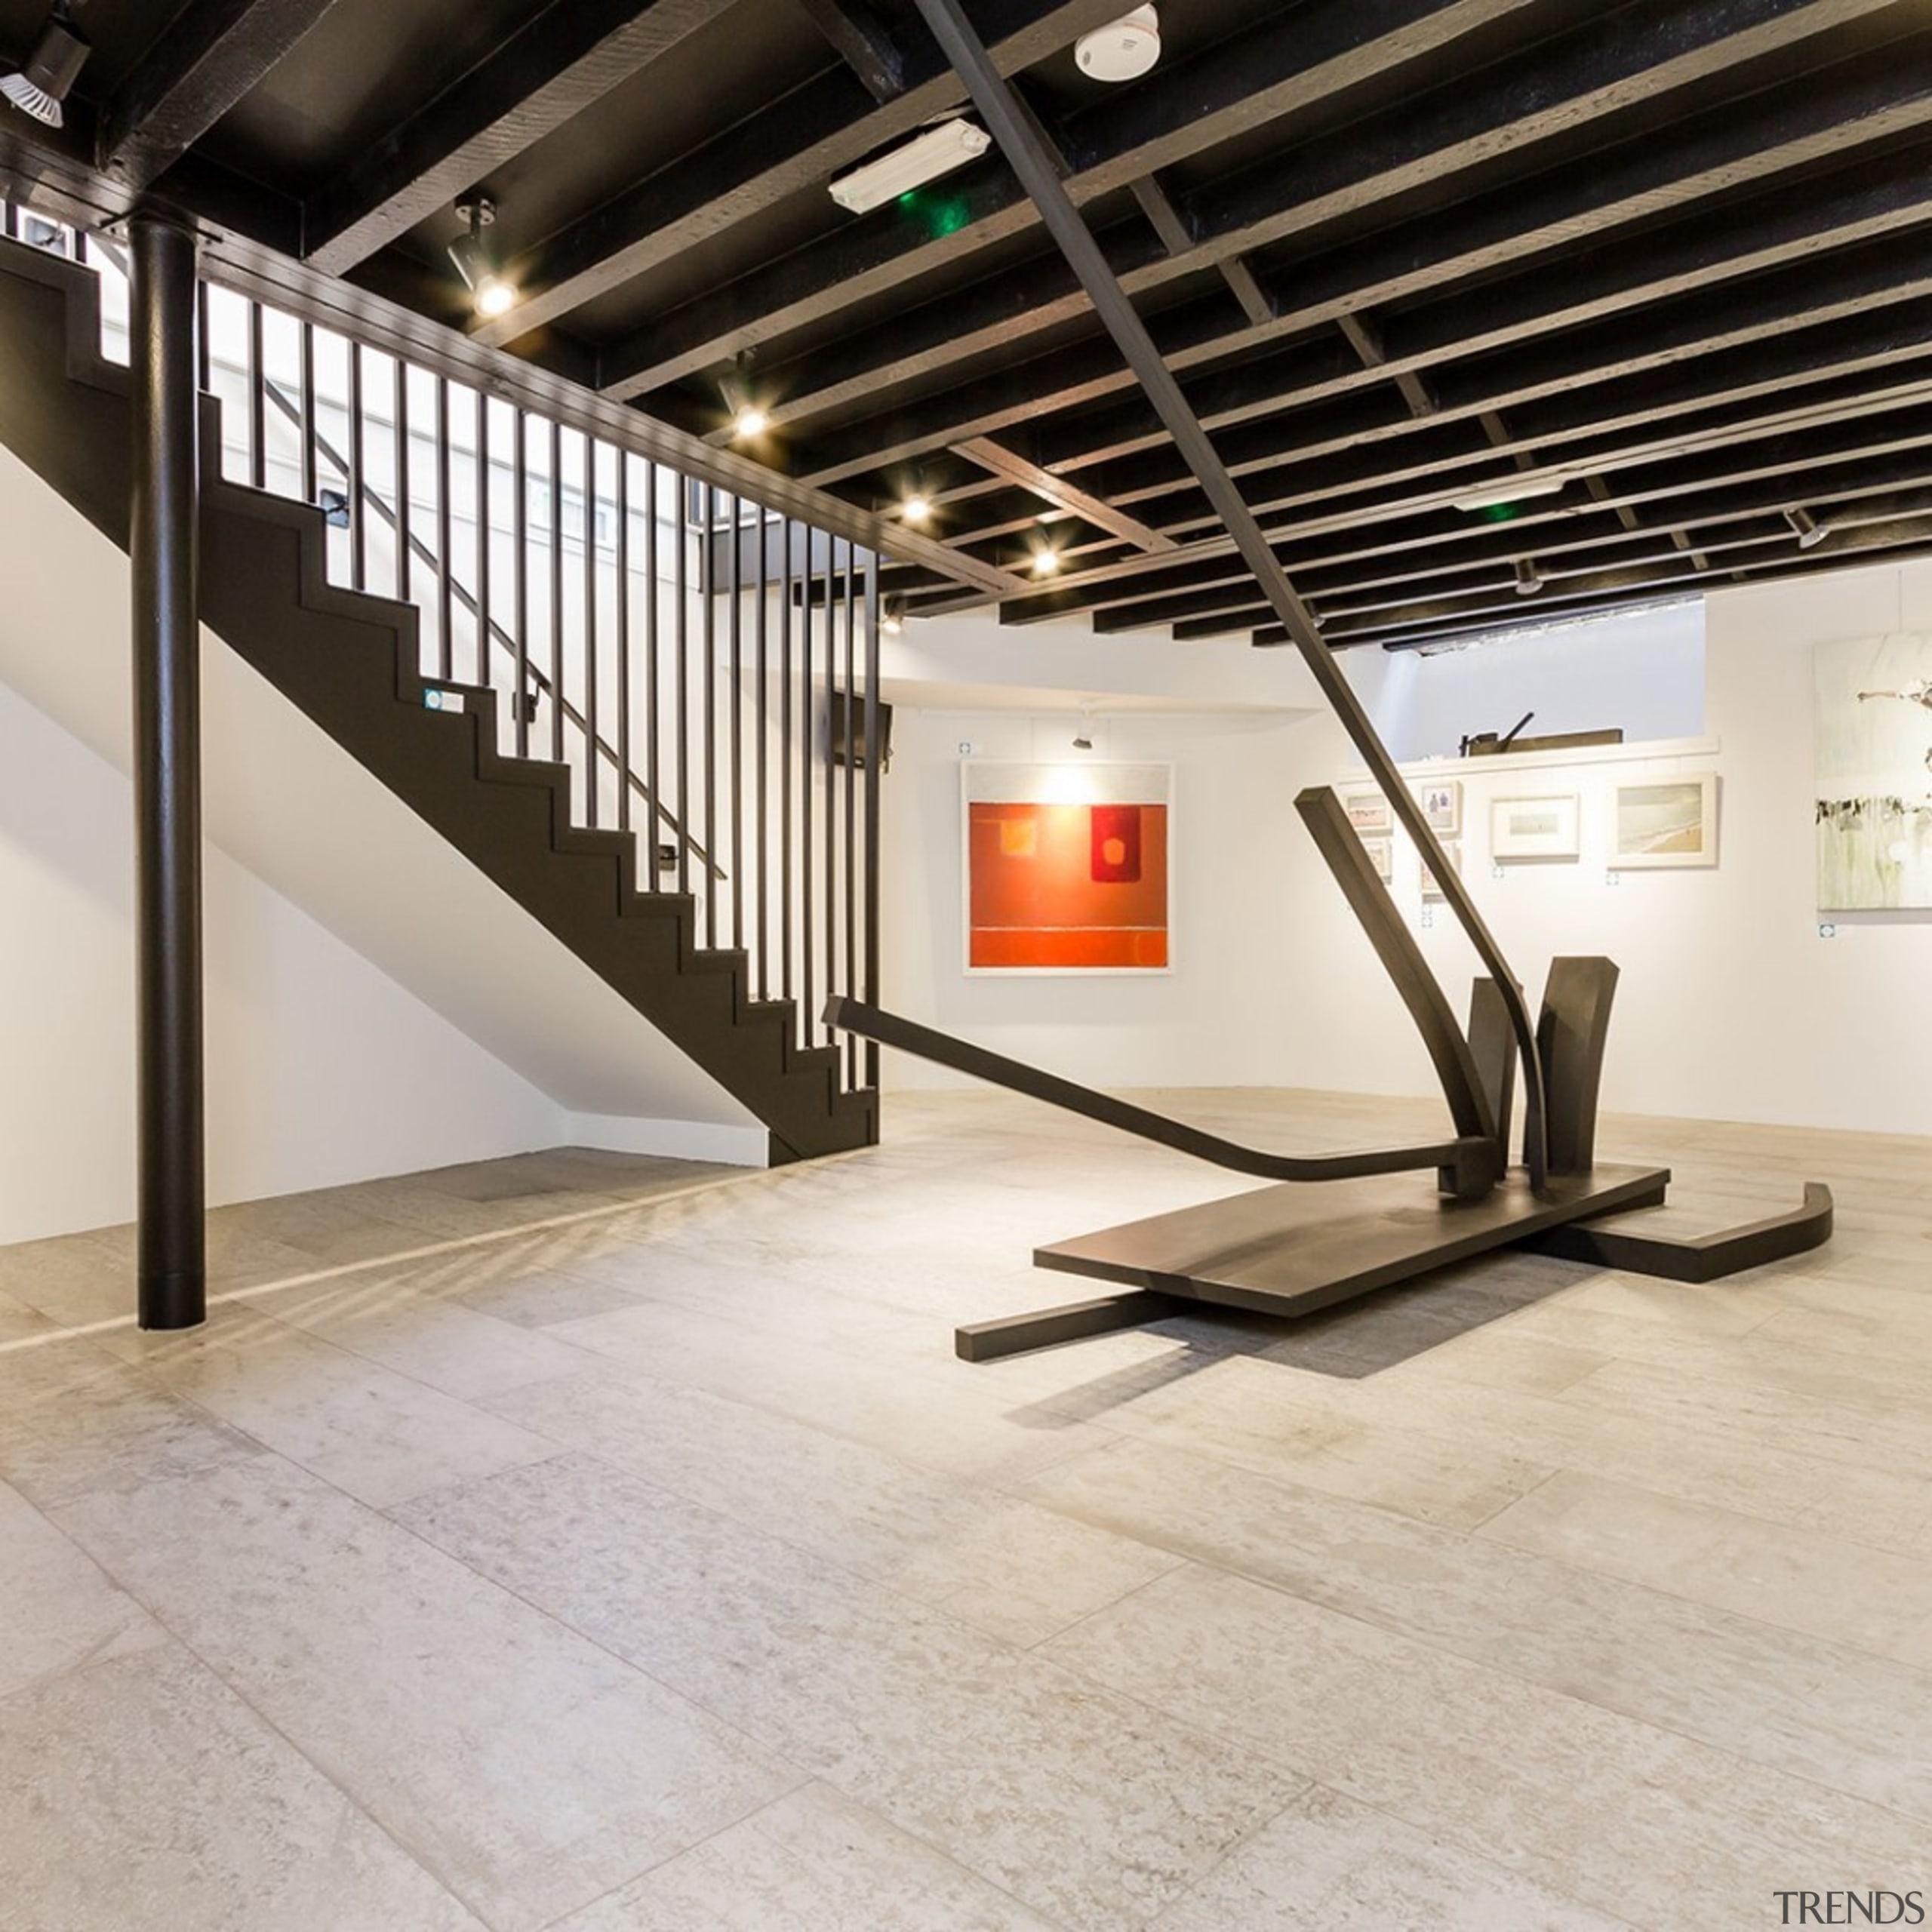 Concreate CF103 3 - Concreate_CF103_3 - floor | floor, flooring, interior design, product design, tile, wood flooring, gray, black